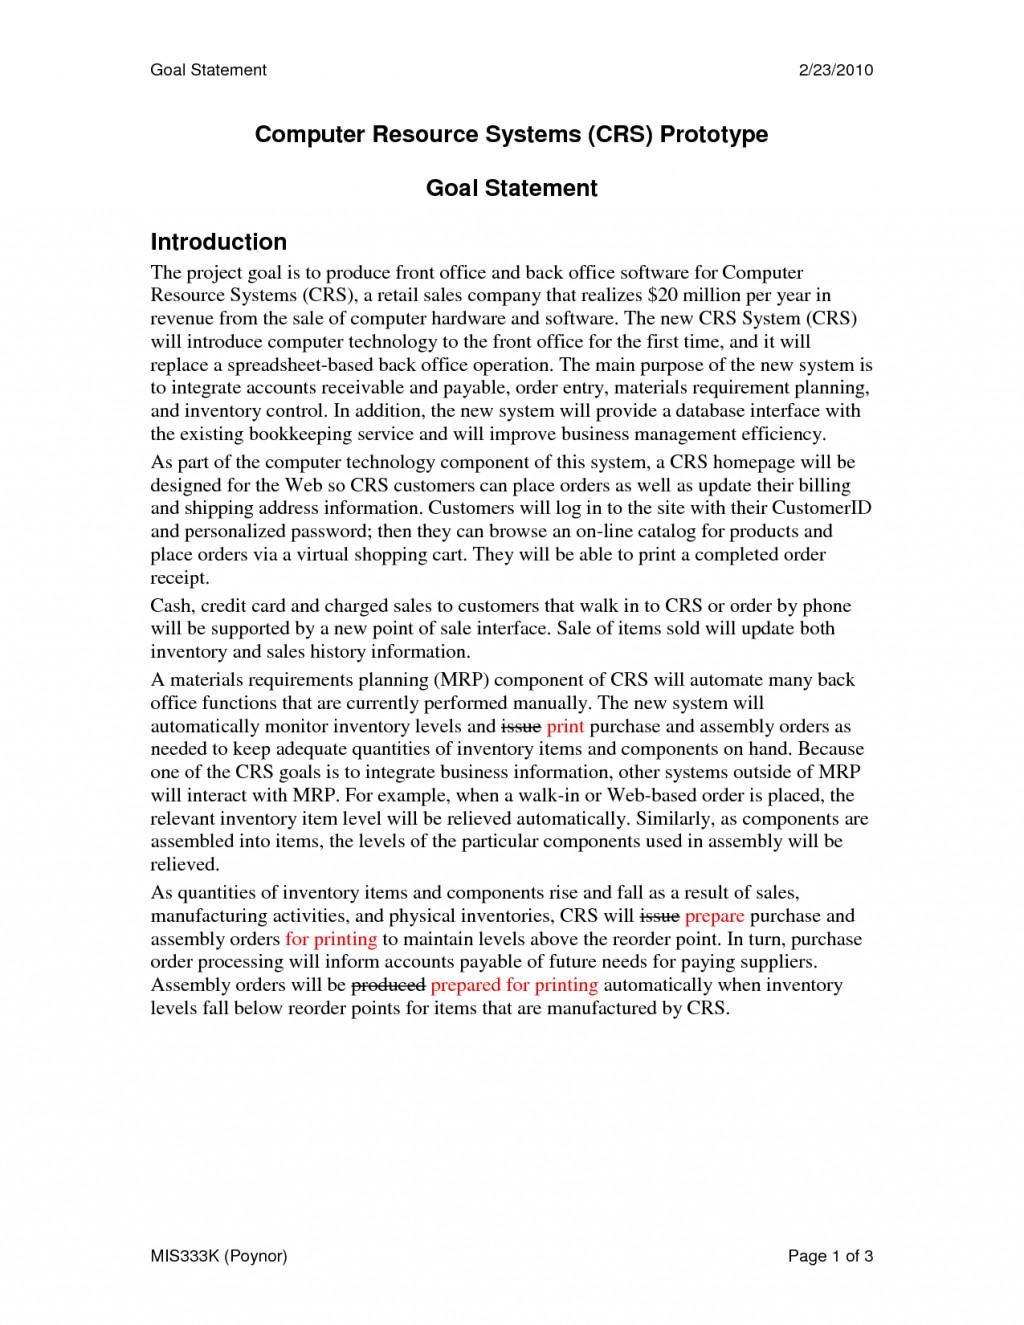 Dissertation - Graduate Program in Social Work